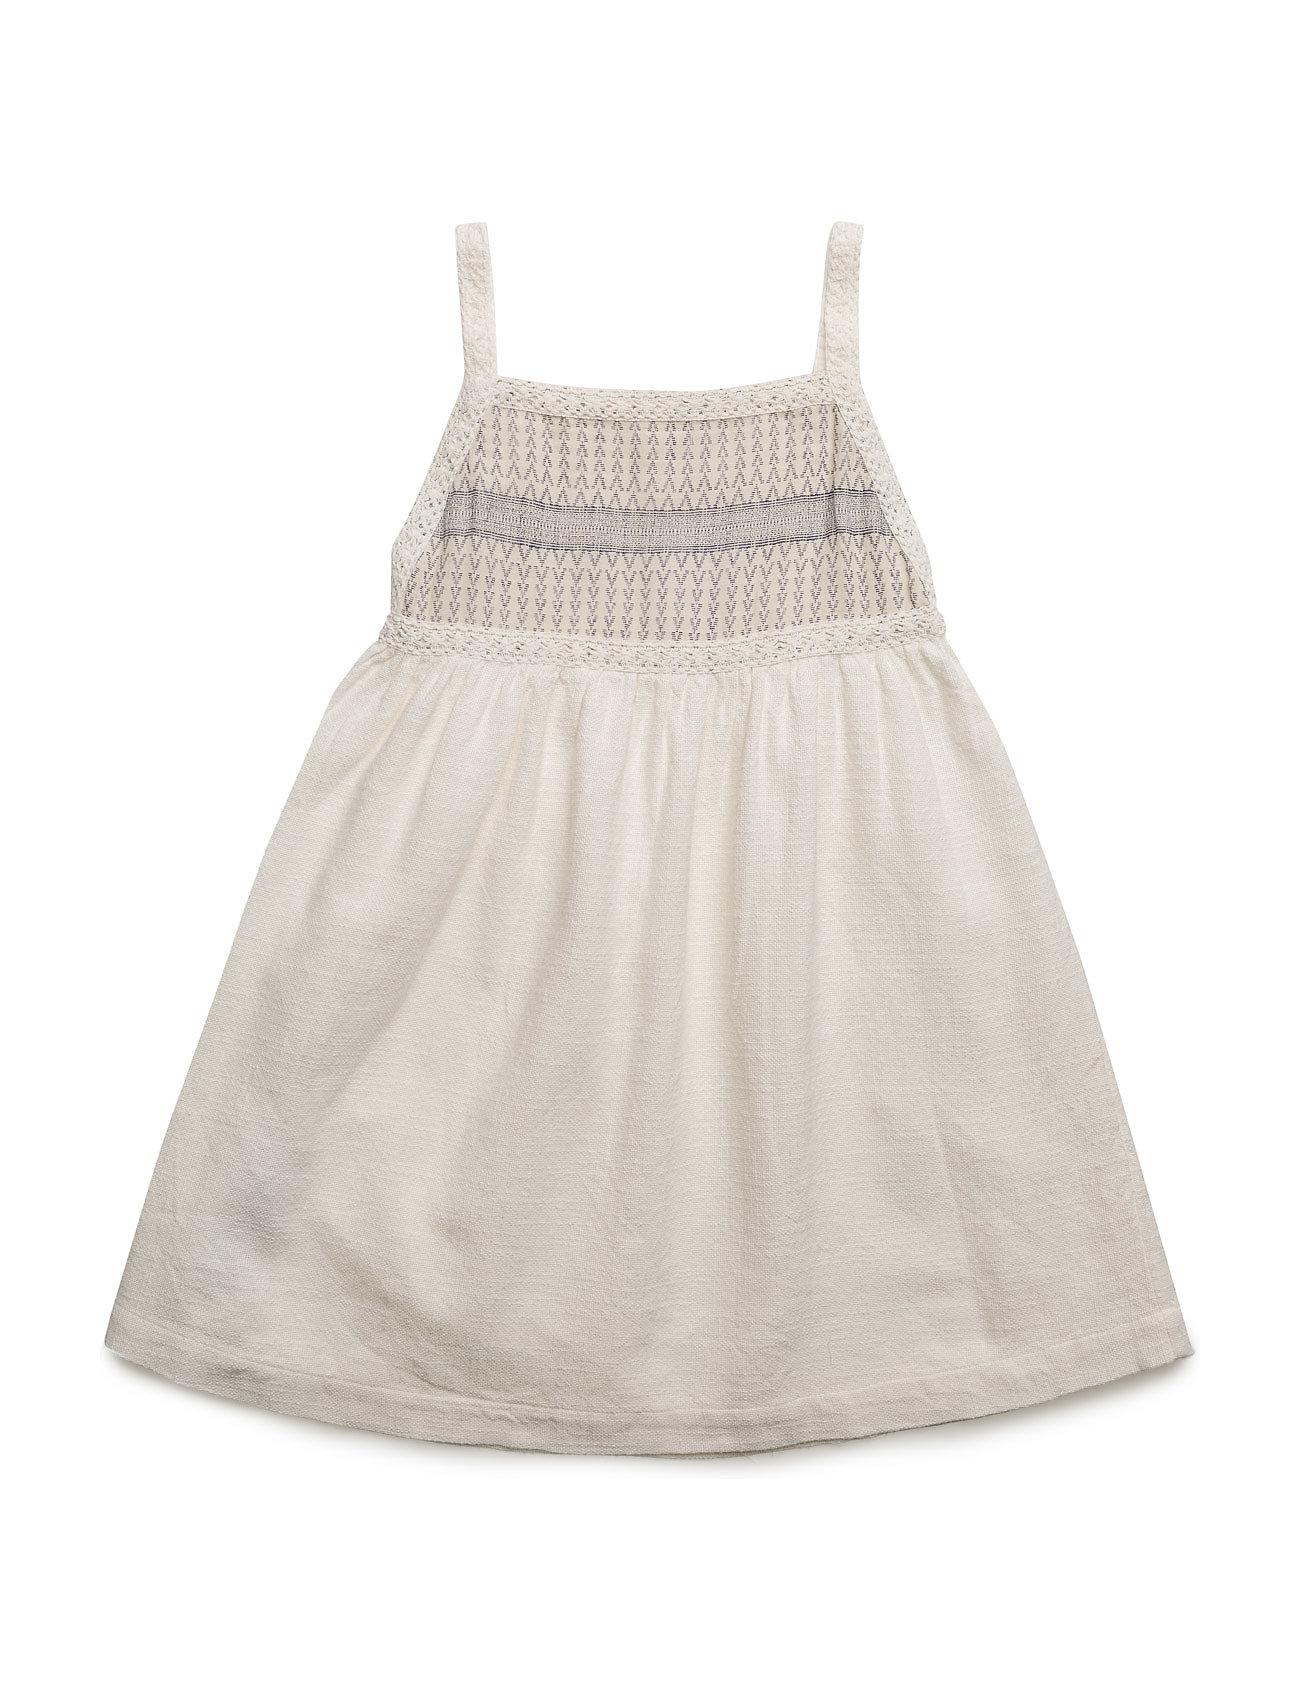 Embroidered Panel Dress Mango Kids Kjoler til Børn i Natural White